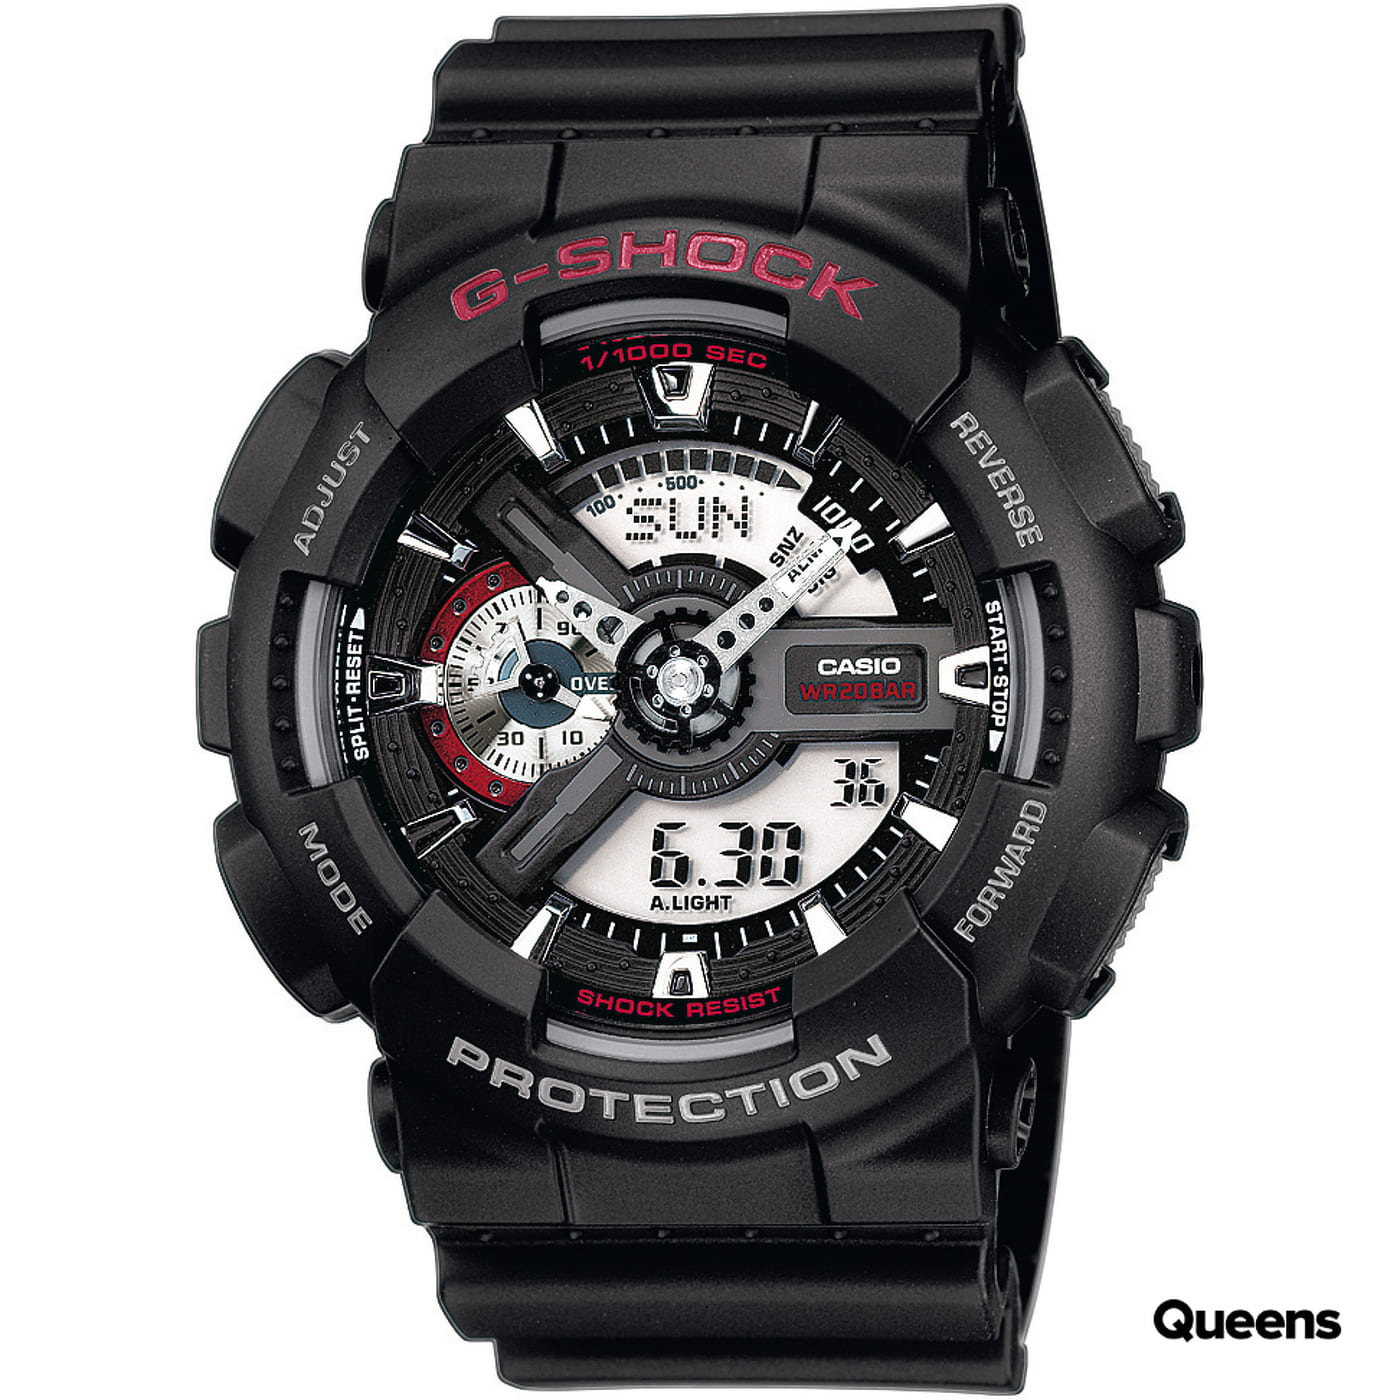 Casio G-Shock GA 110-1AER čierne / červené